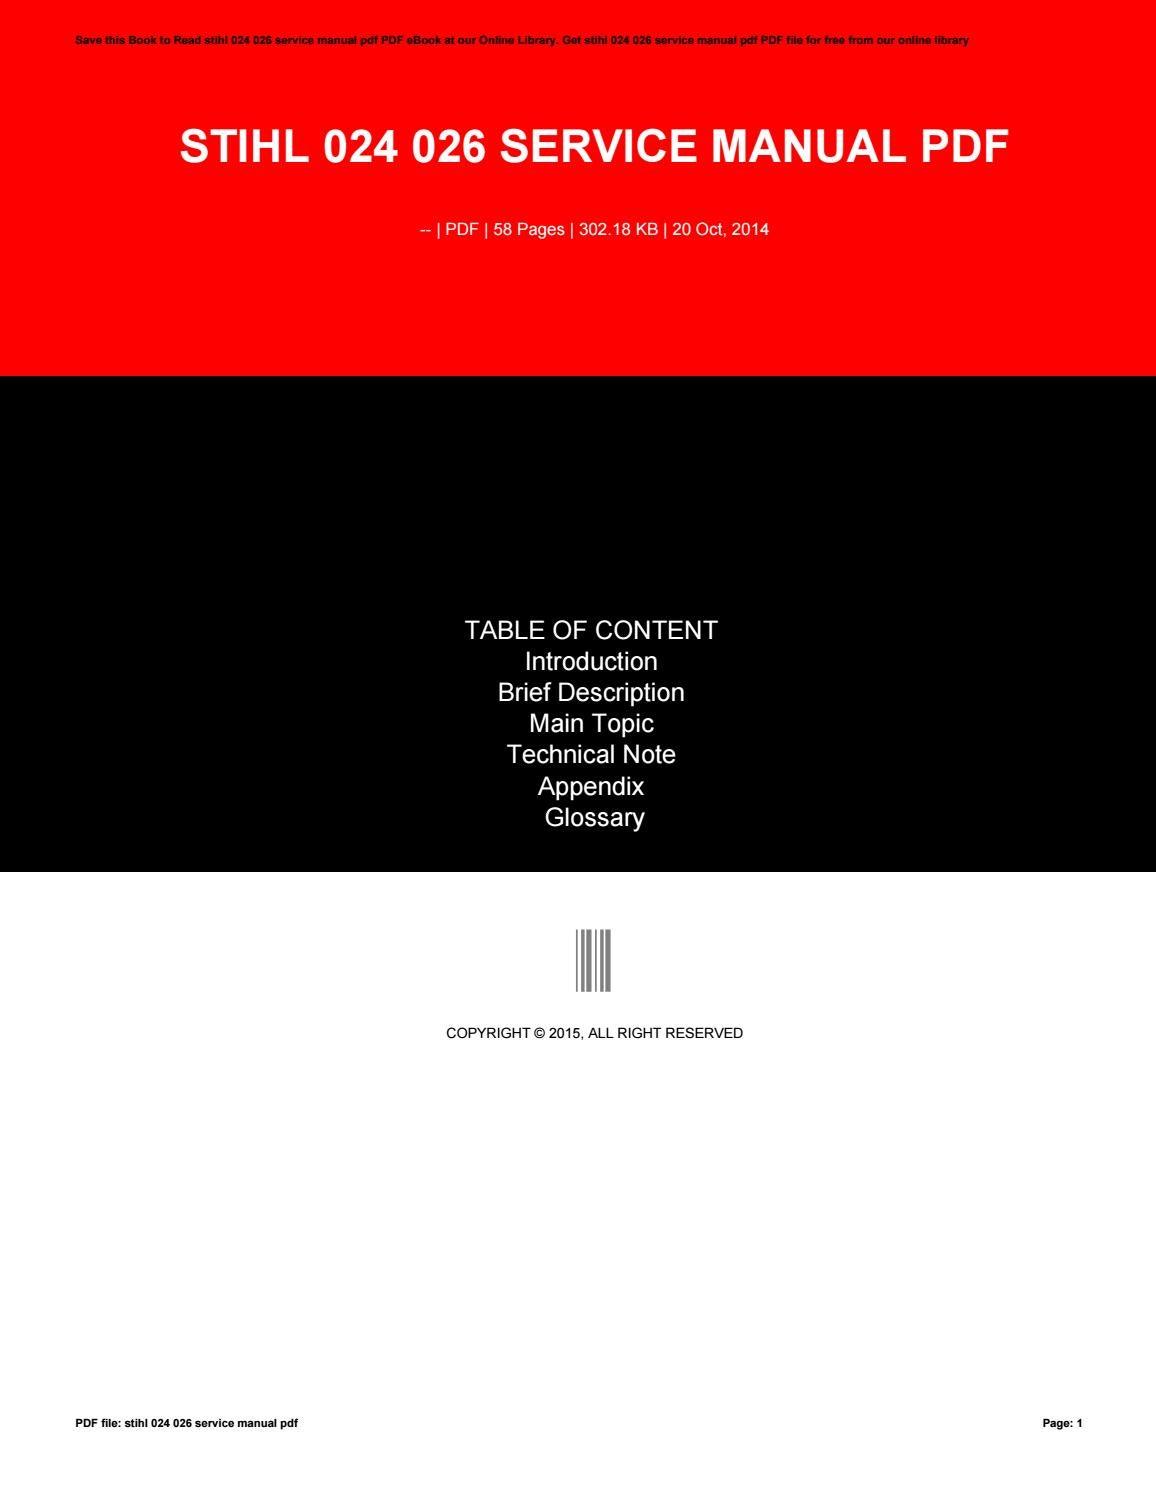 stihl 024 av service manual pdf